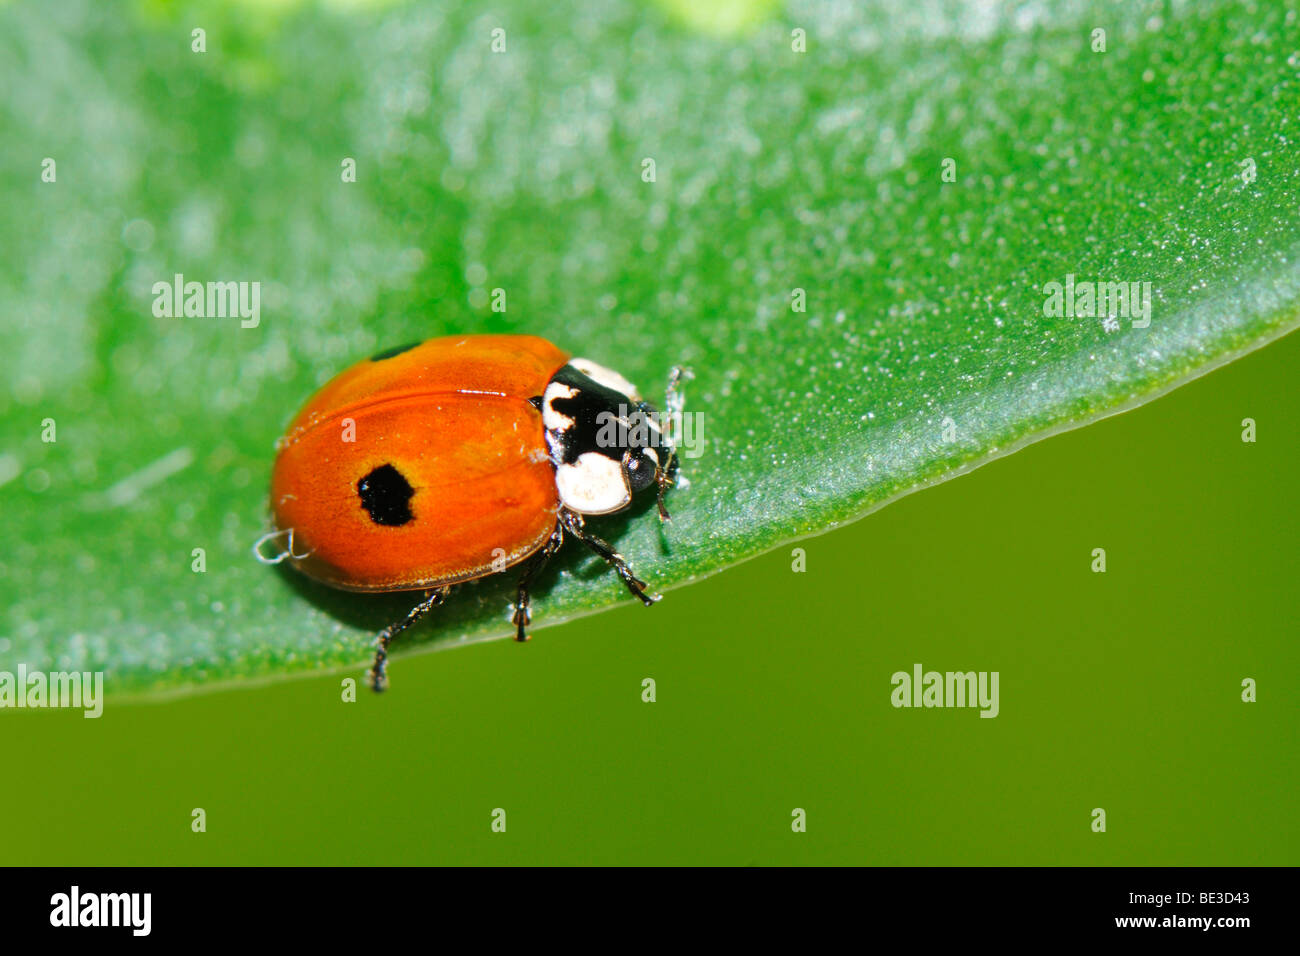 Two-spotted Lady Beetle (Adalia bipunctata) - Stock Image